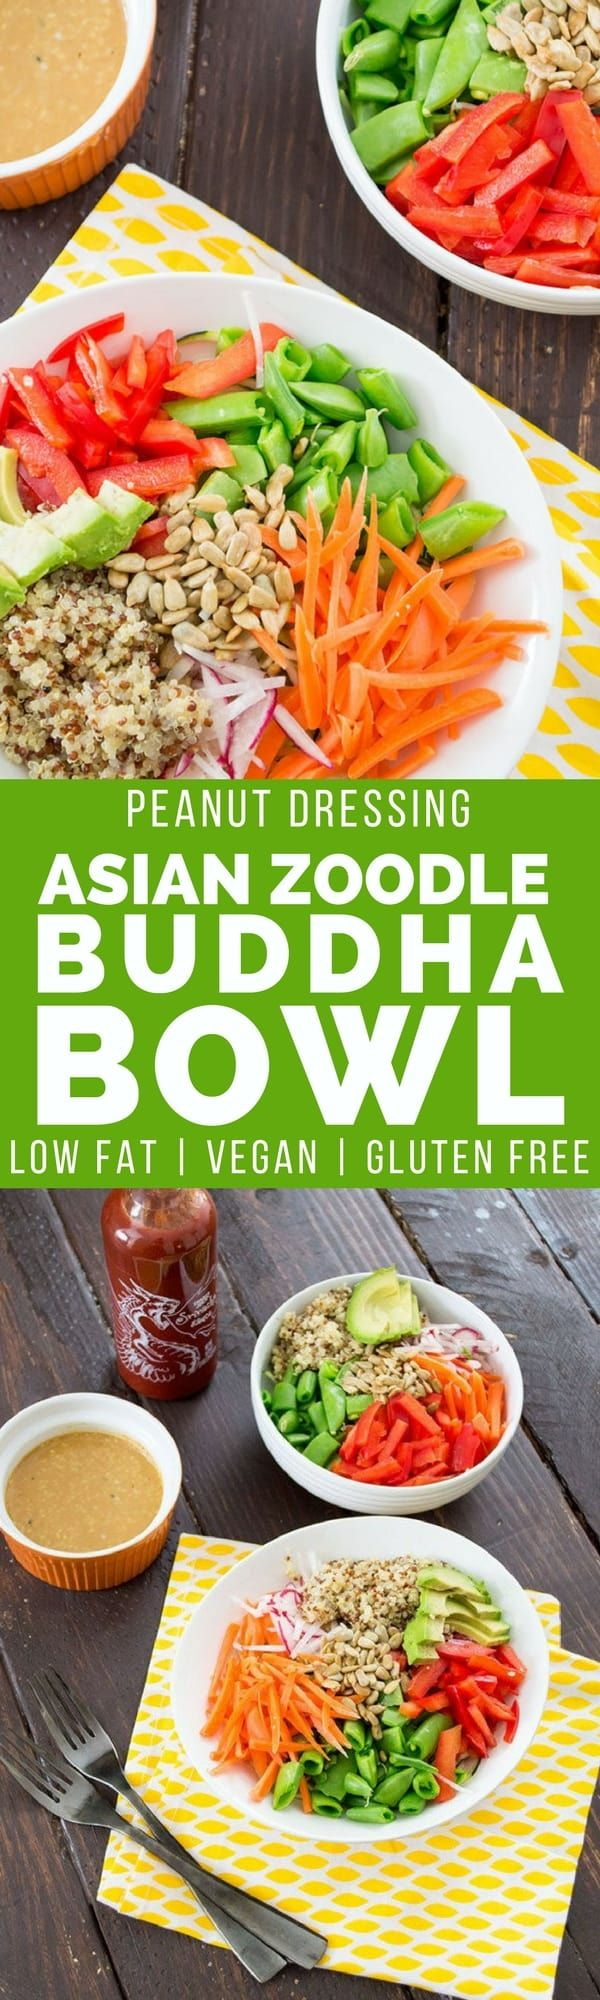 Low Carb Vegan Buddha Bowl